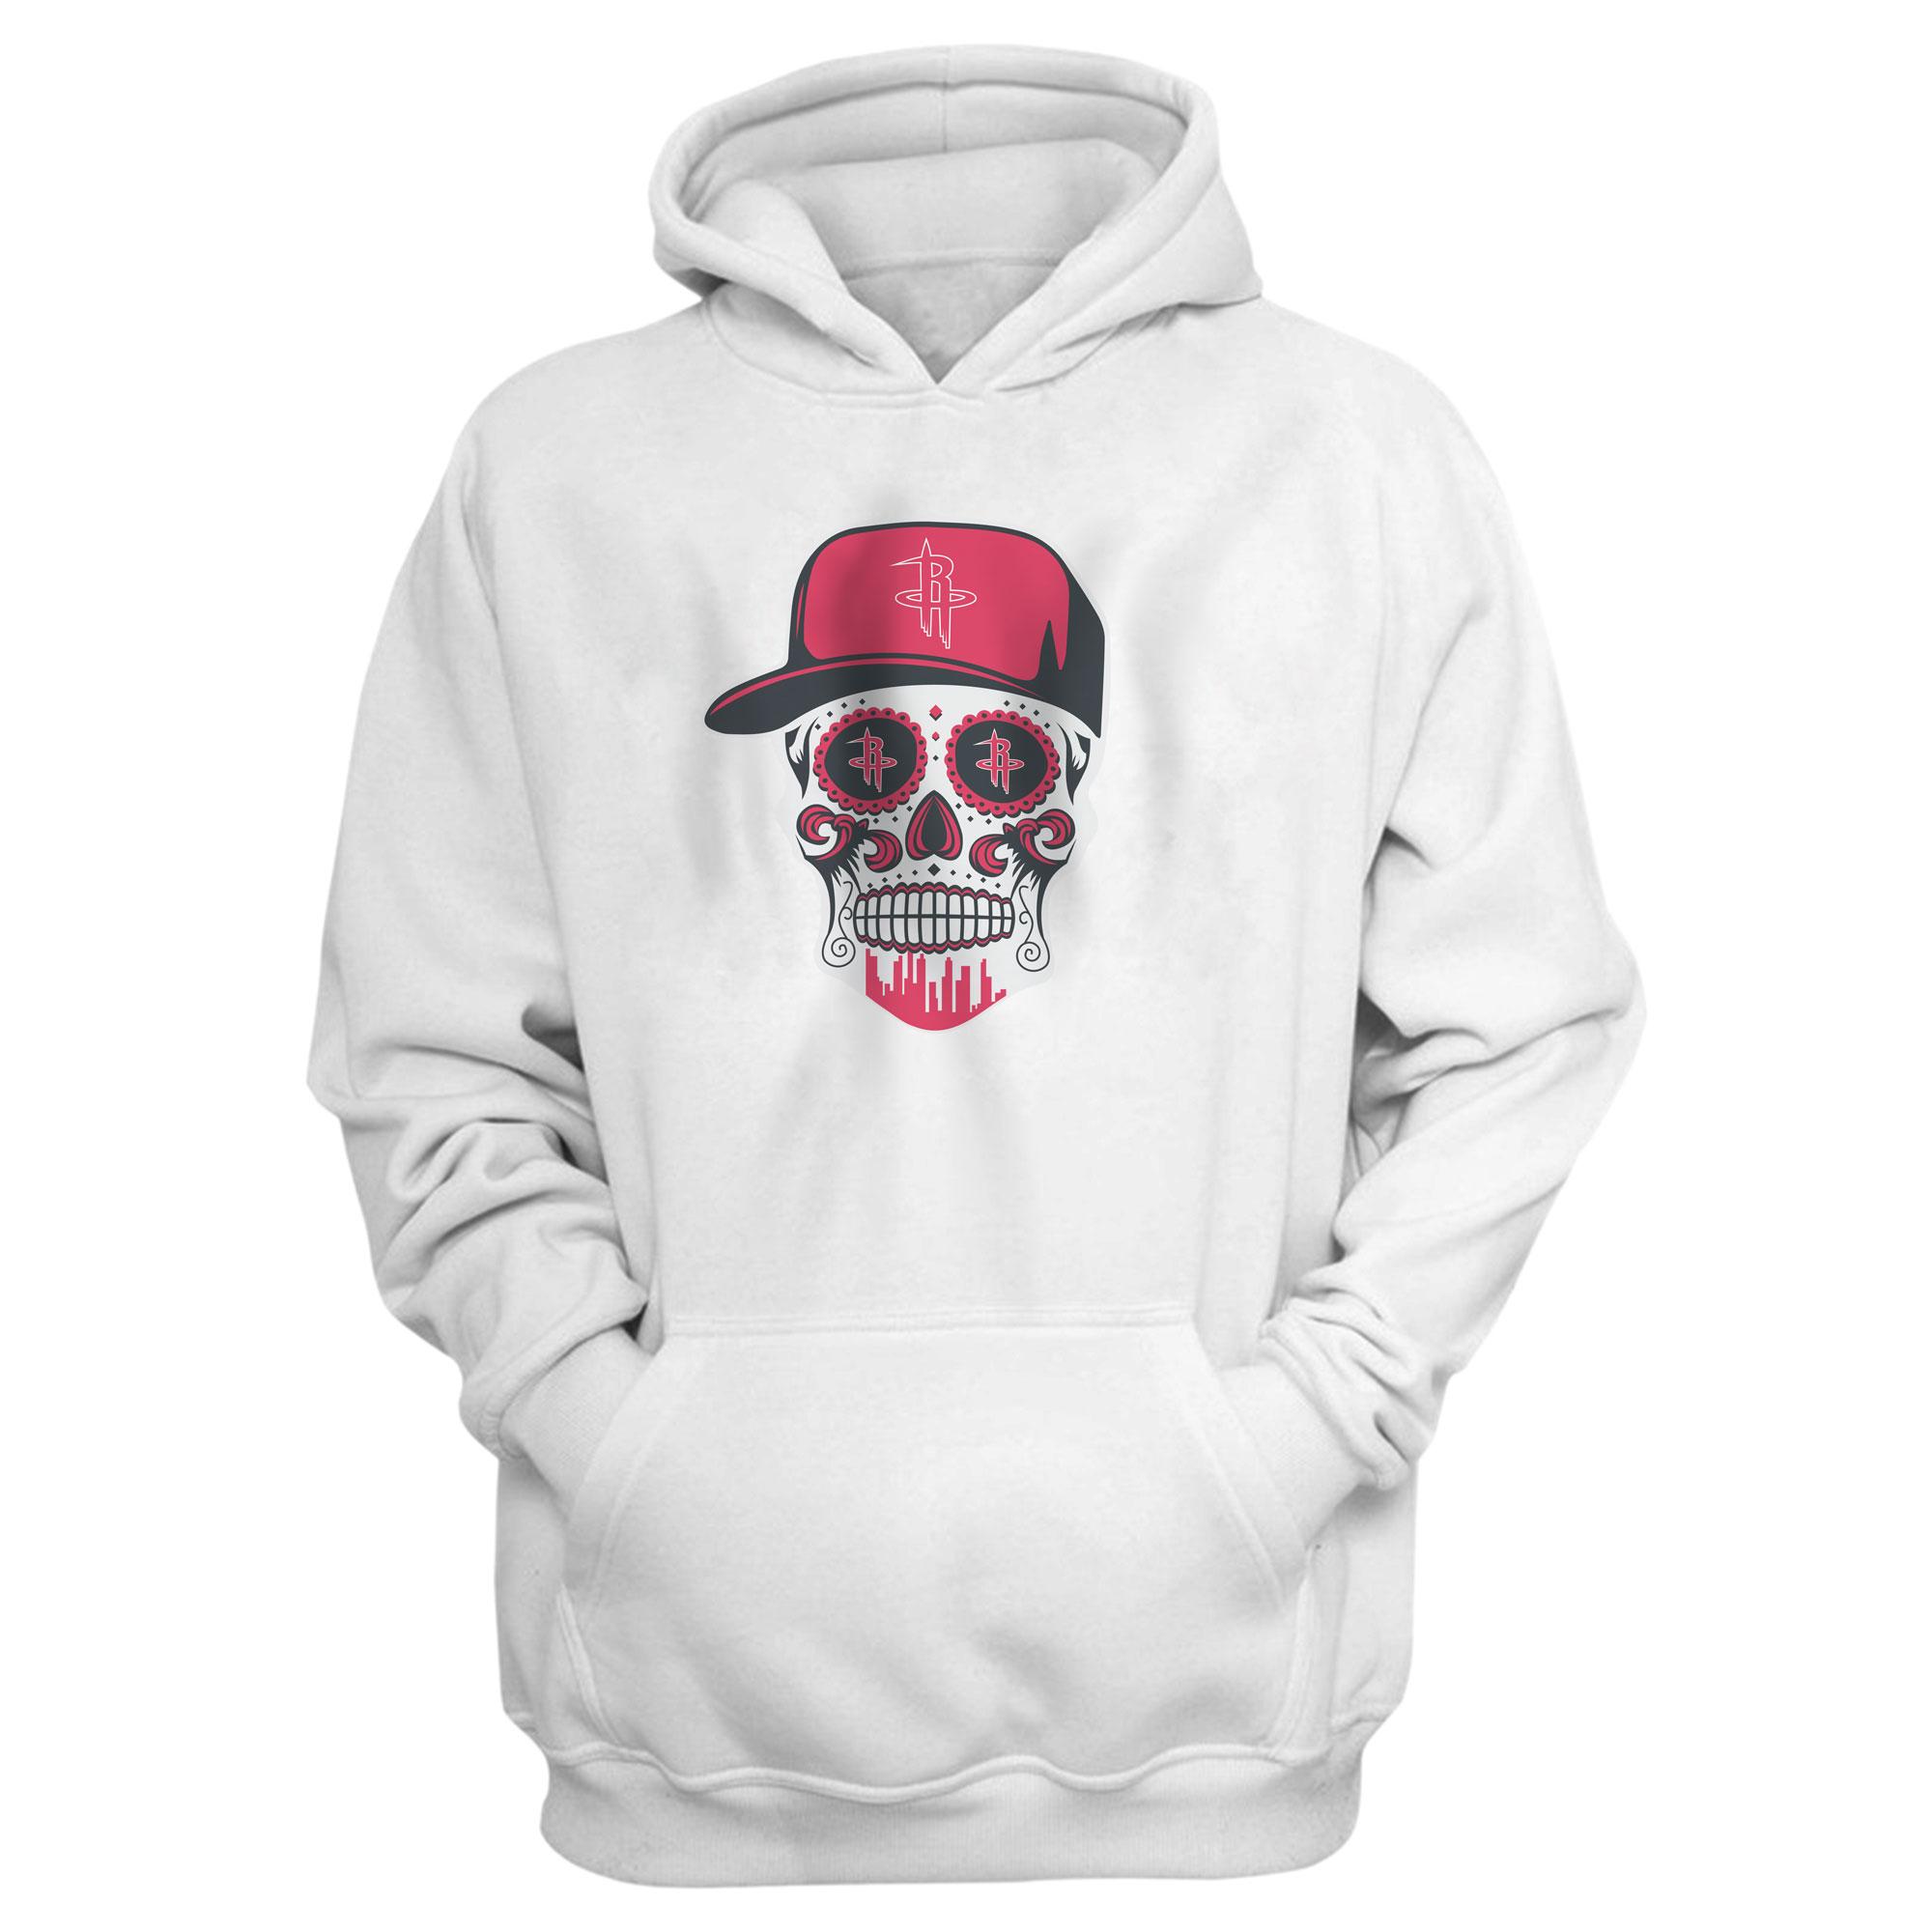 Rockets Skull Hoodie (HD-WHT-NP-453-NBA-HOU-SKULL)